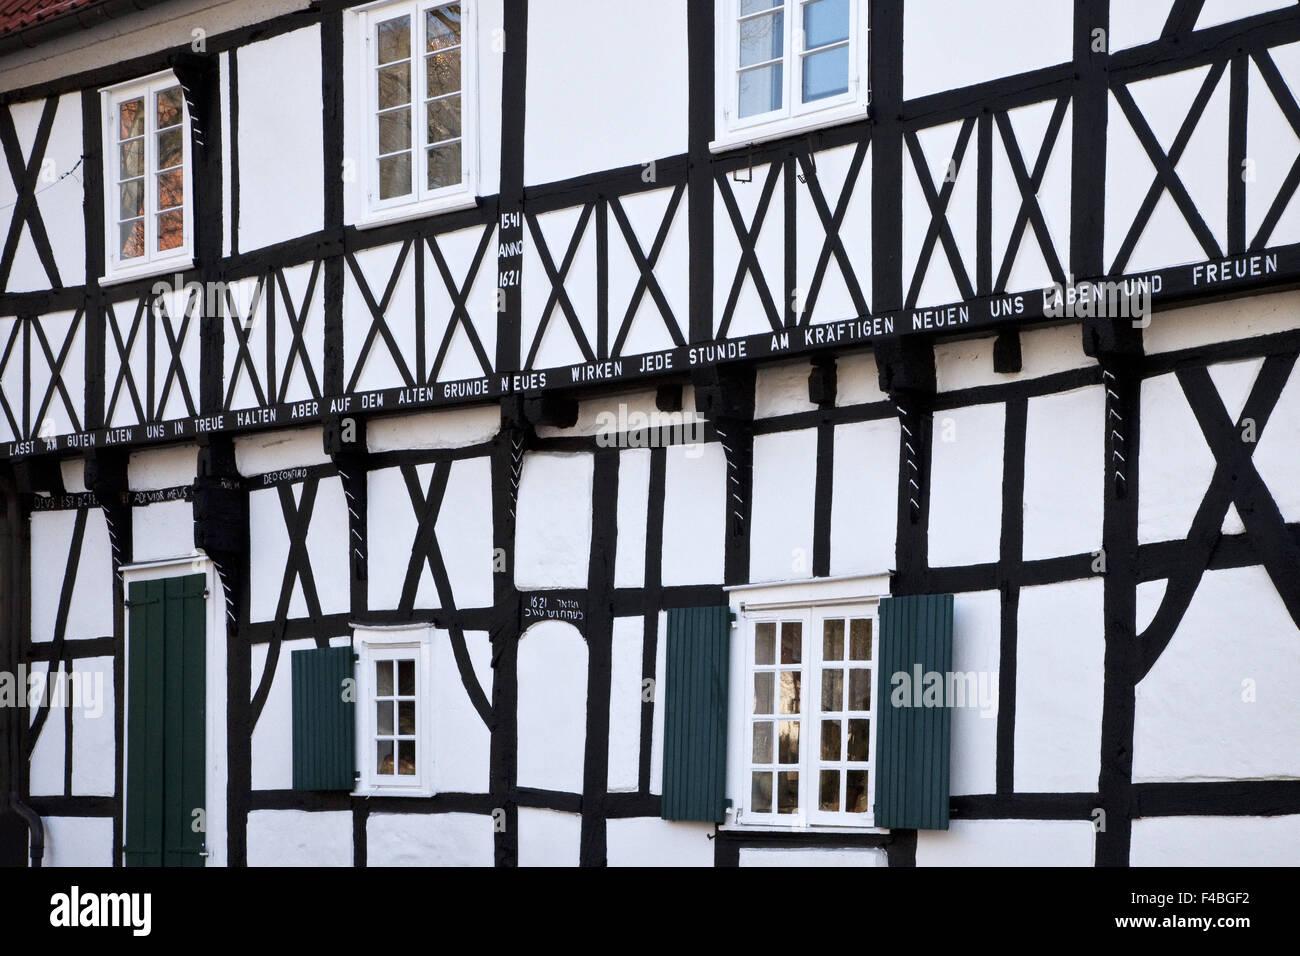 Detaillierten Fachwerkhaus, Wetter-Wengern. Stockbild